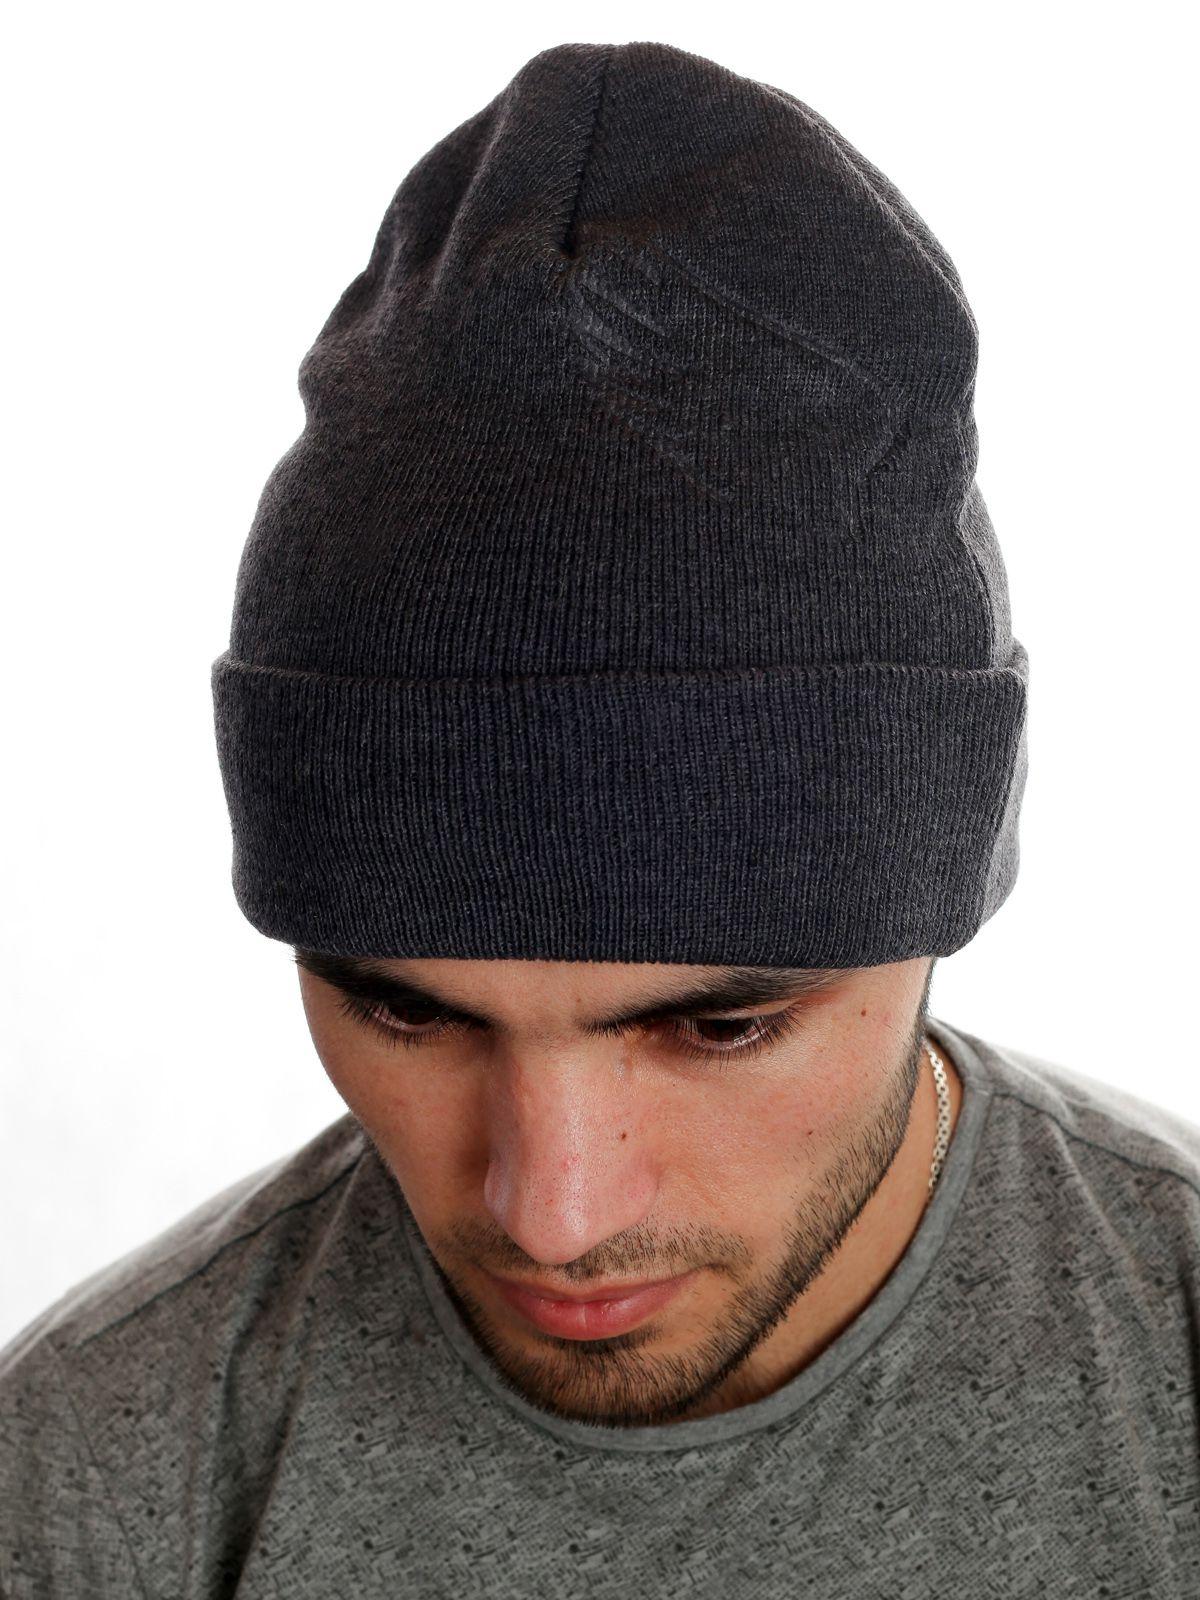 Купить мужскую спортивную шапочку онлайн